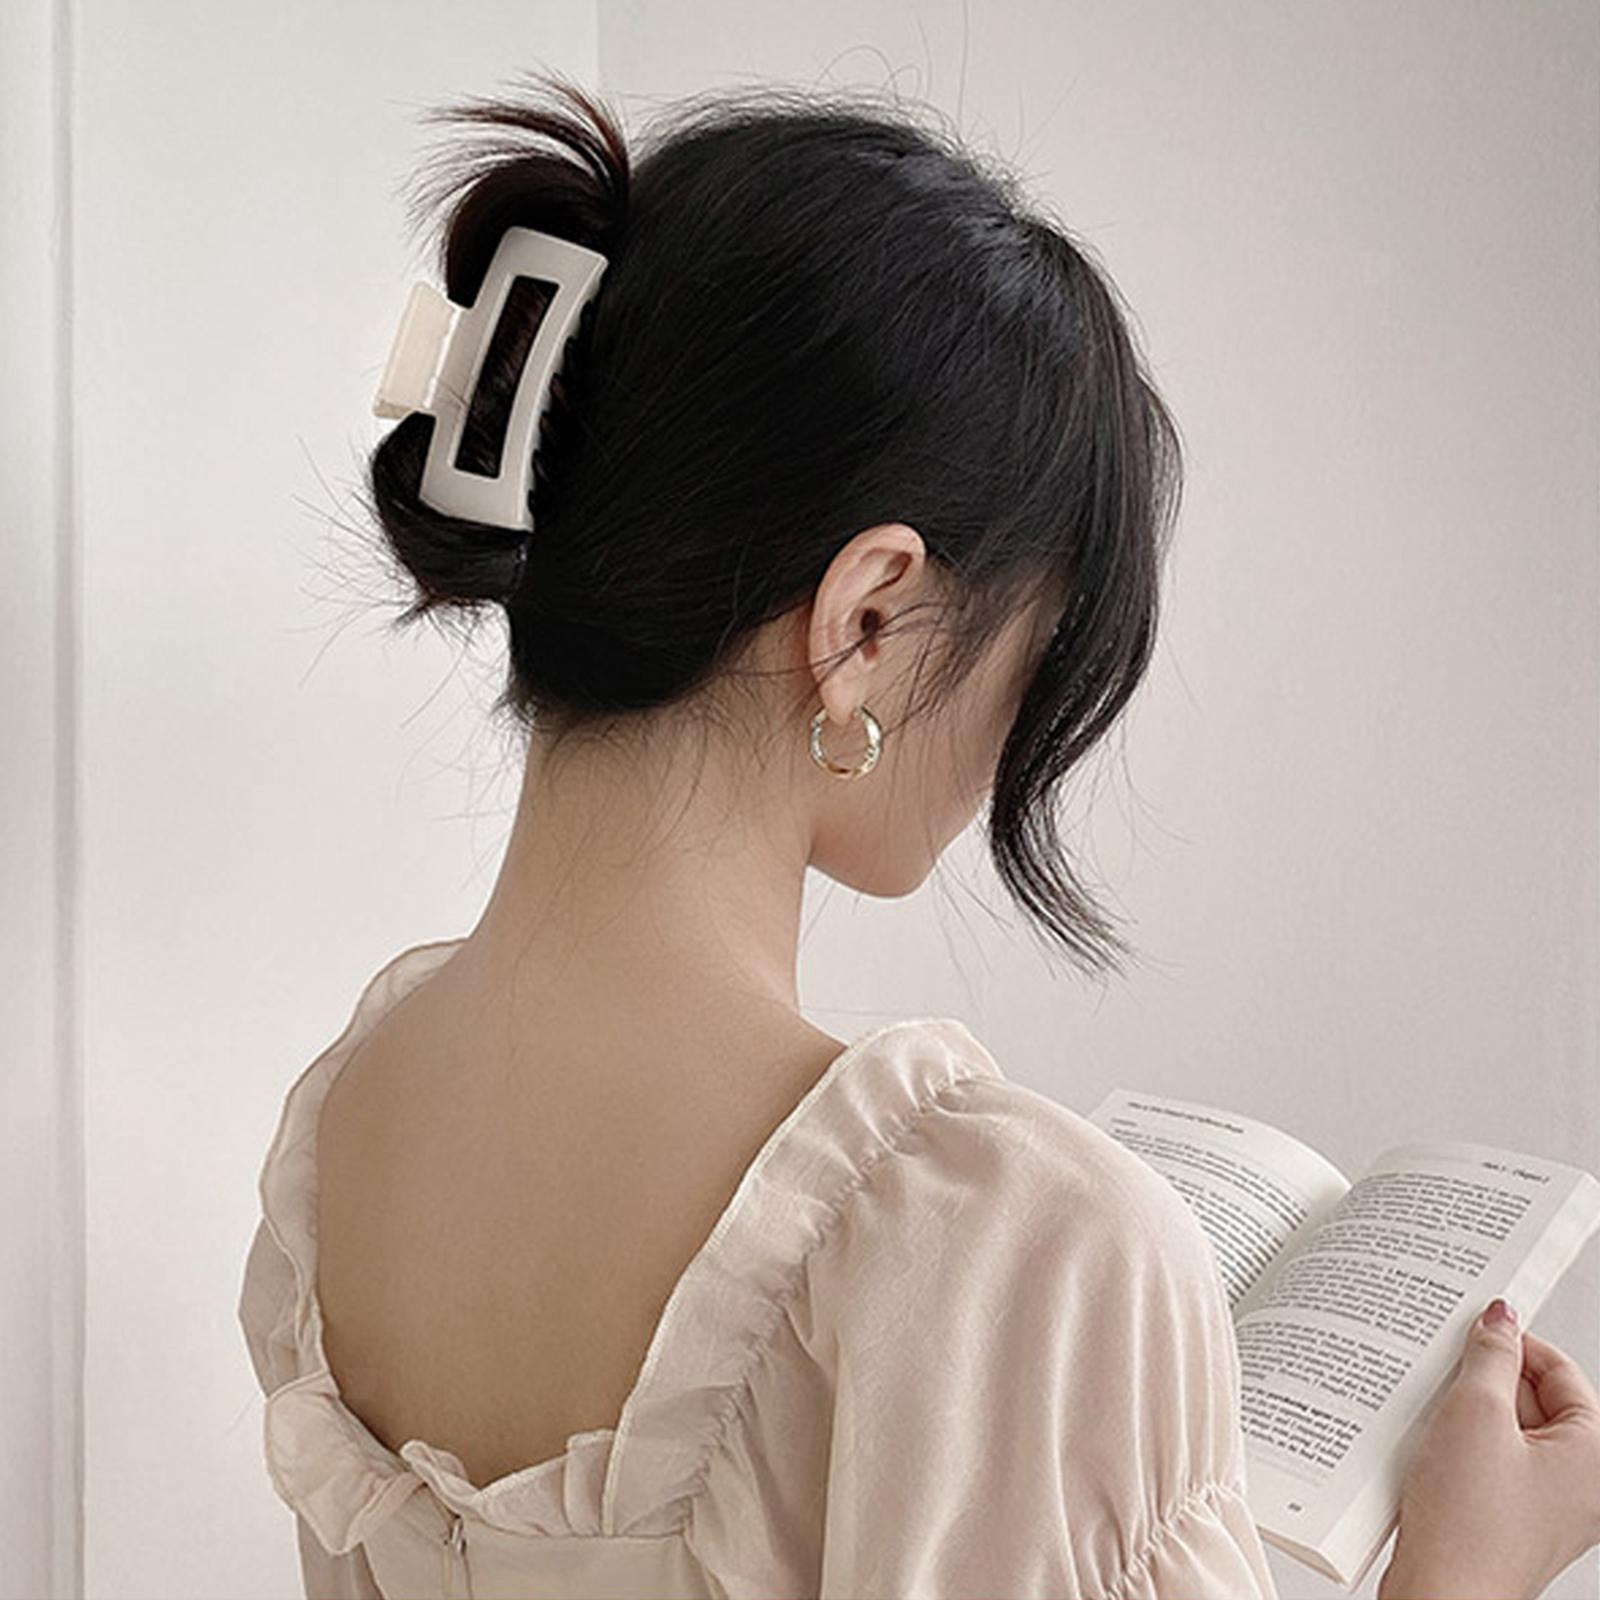 thumbnail 3 - Large Hair Clip Claws Rectangle Hair Jaw Hairpins Grip for Women Thick Hair